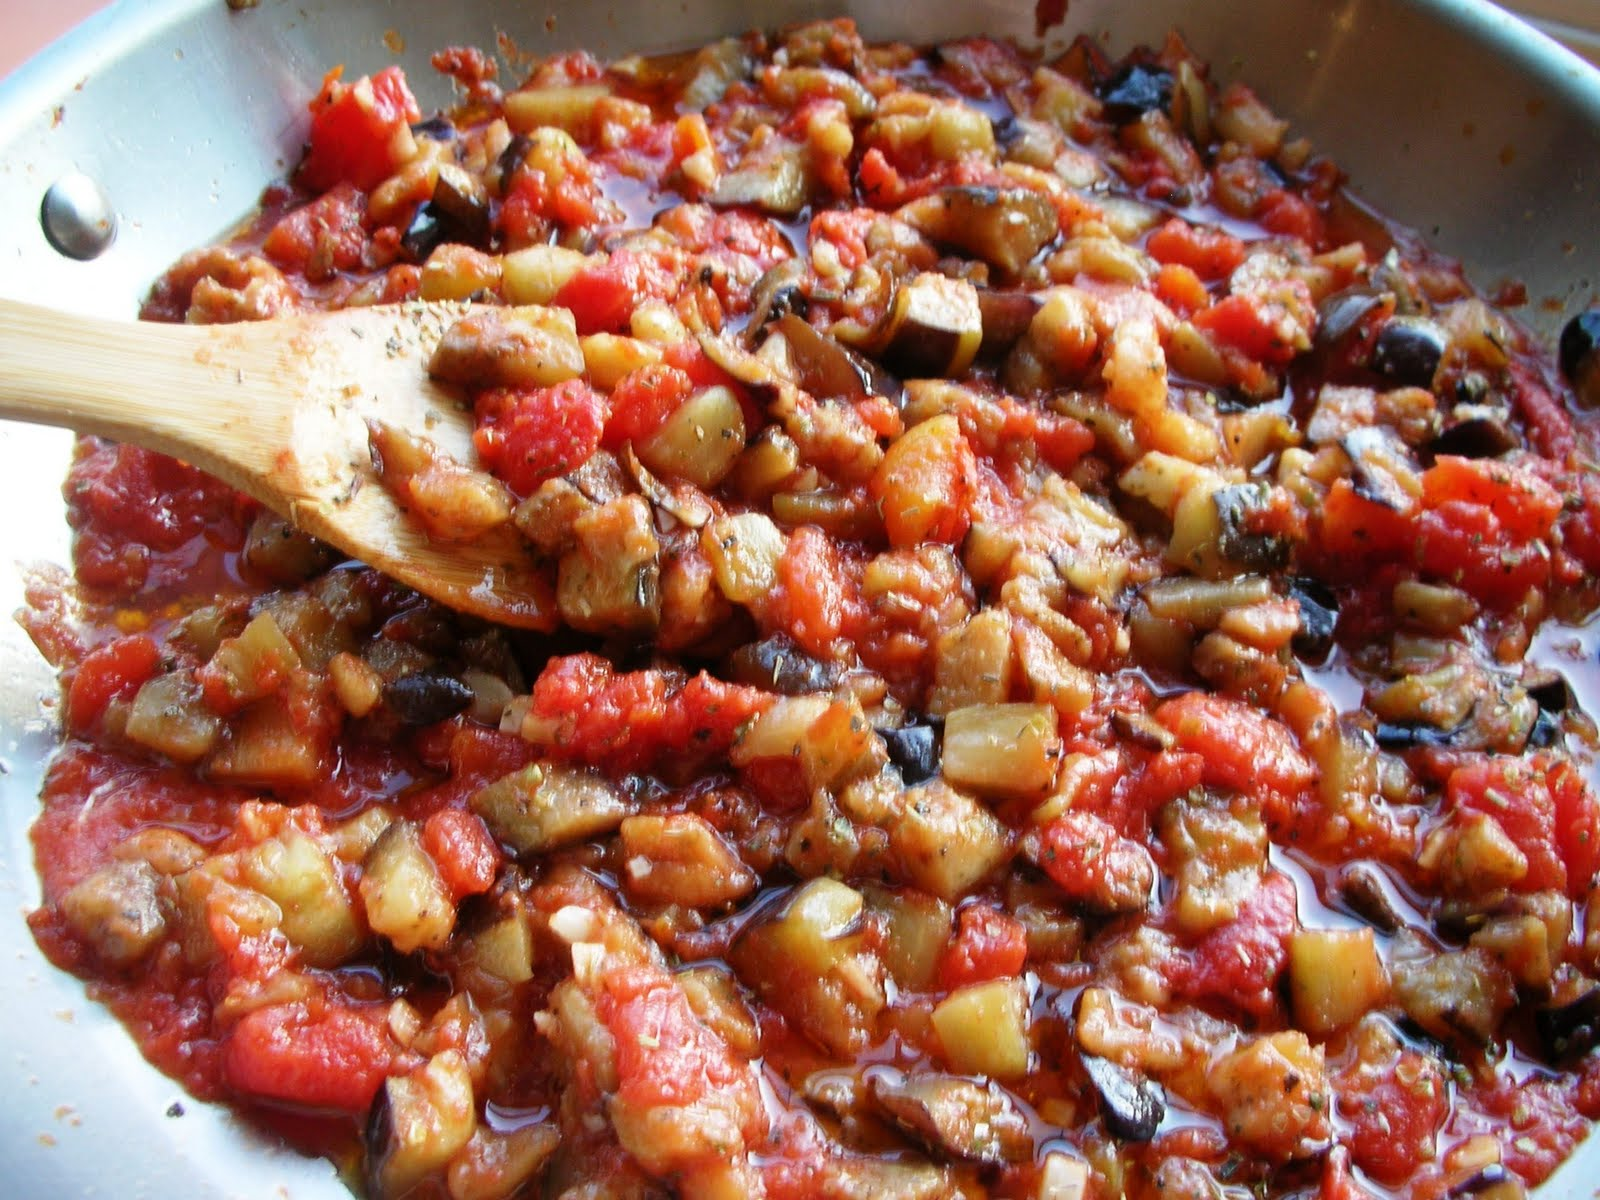 Aubergine Parmigiana' with Roasted Tomato Recipe